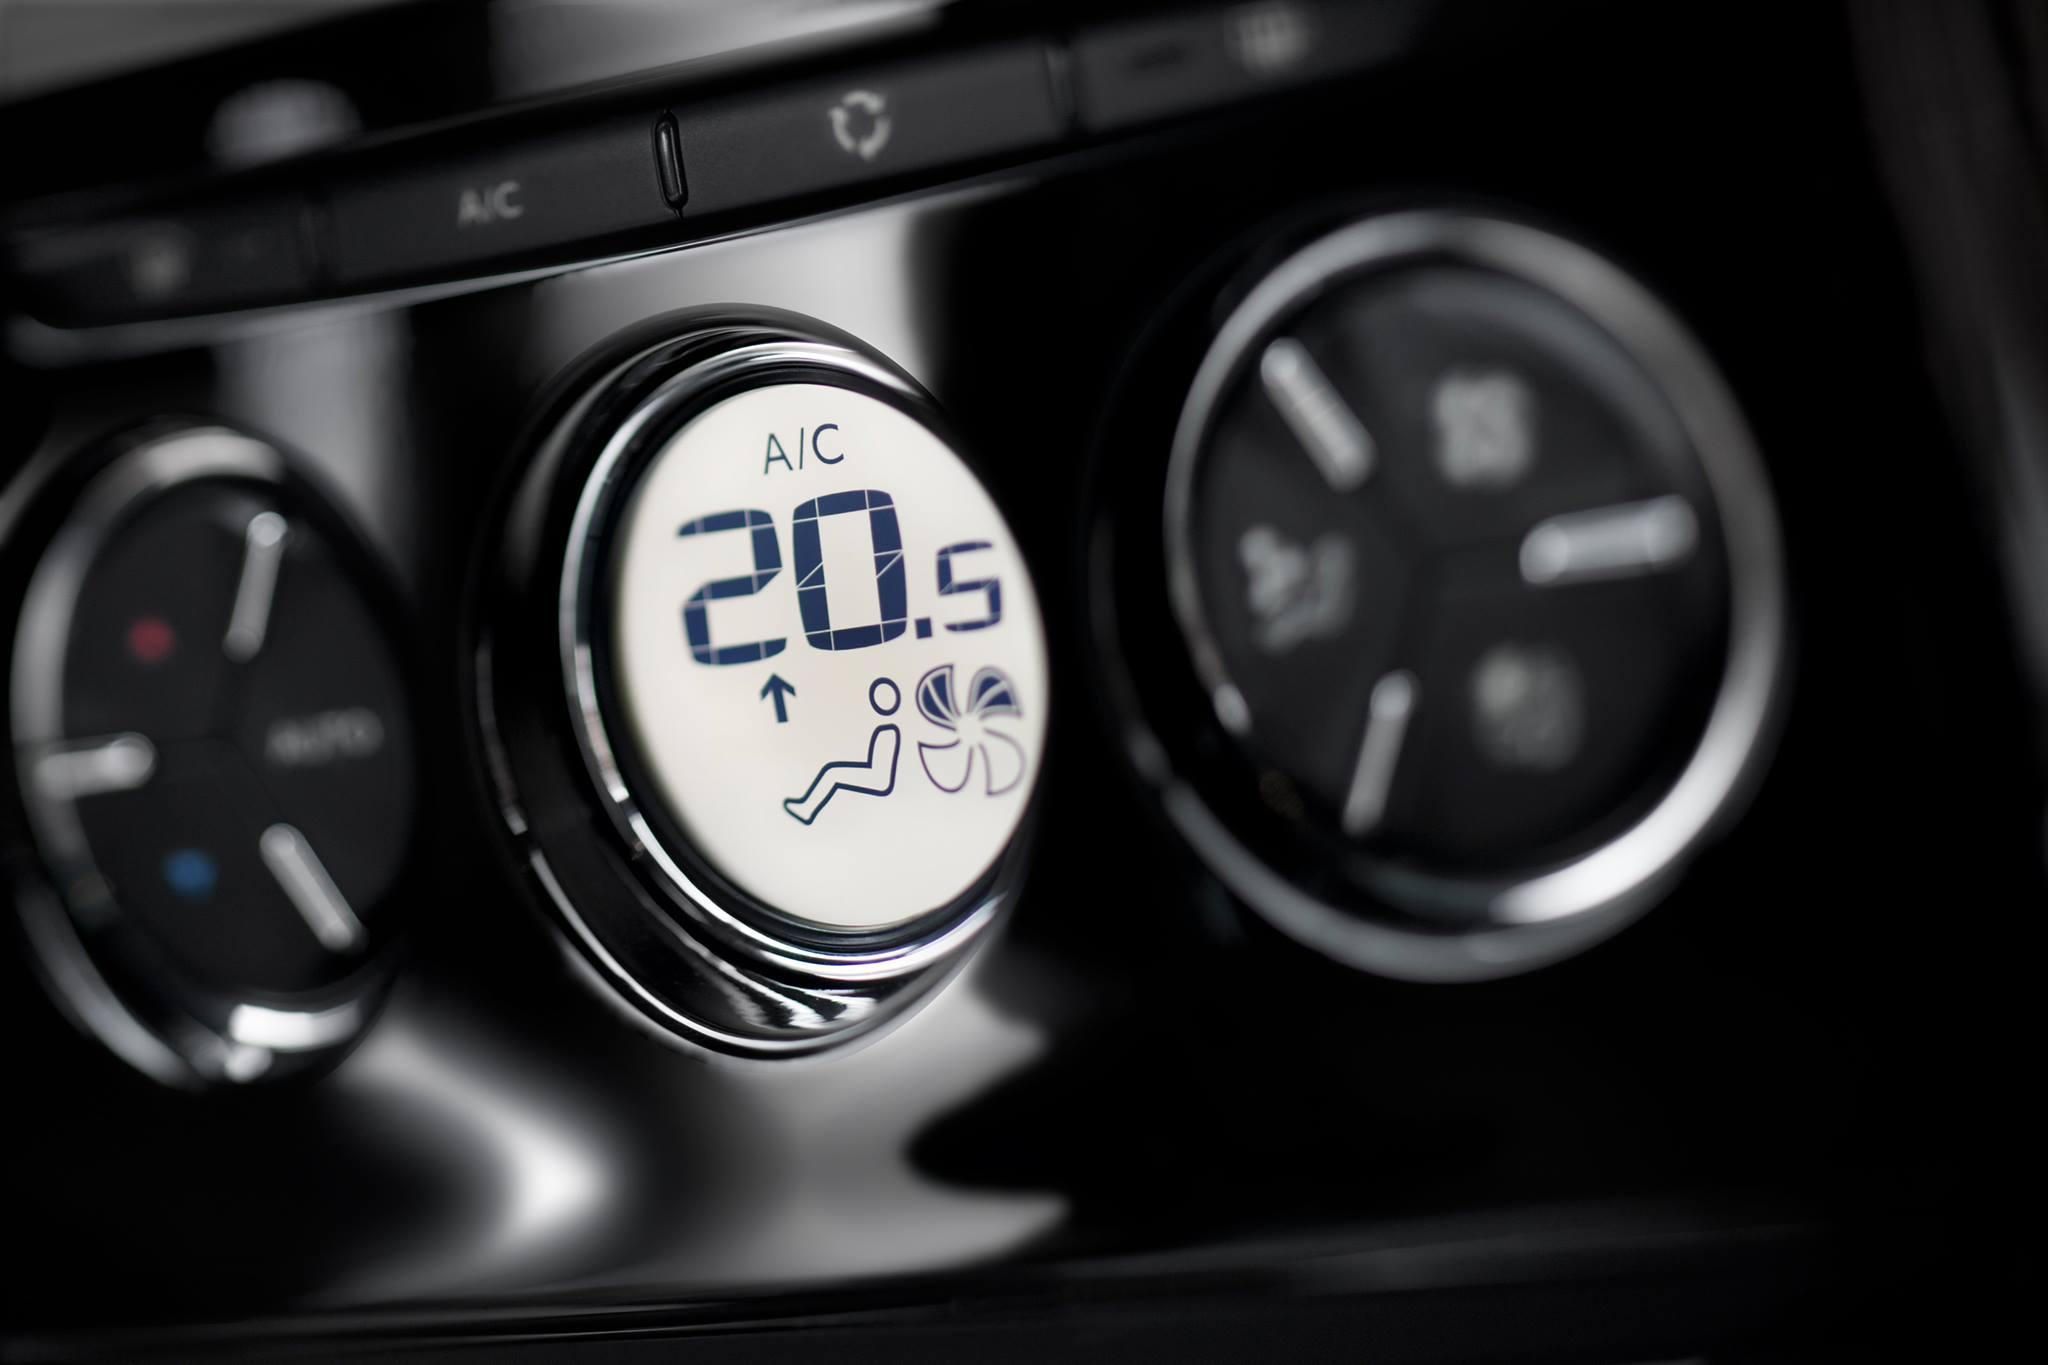 Неприятный запах в салоне при работе или после выключения кондиционера Mitsubishi ASX